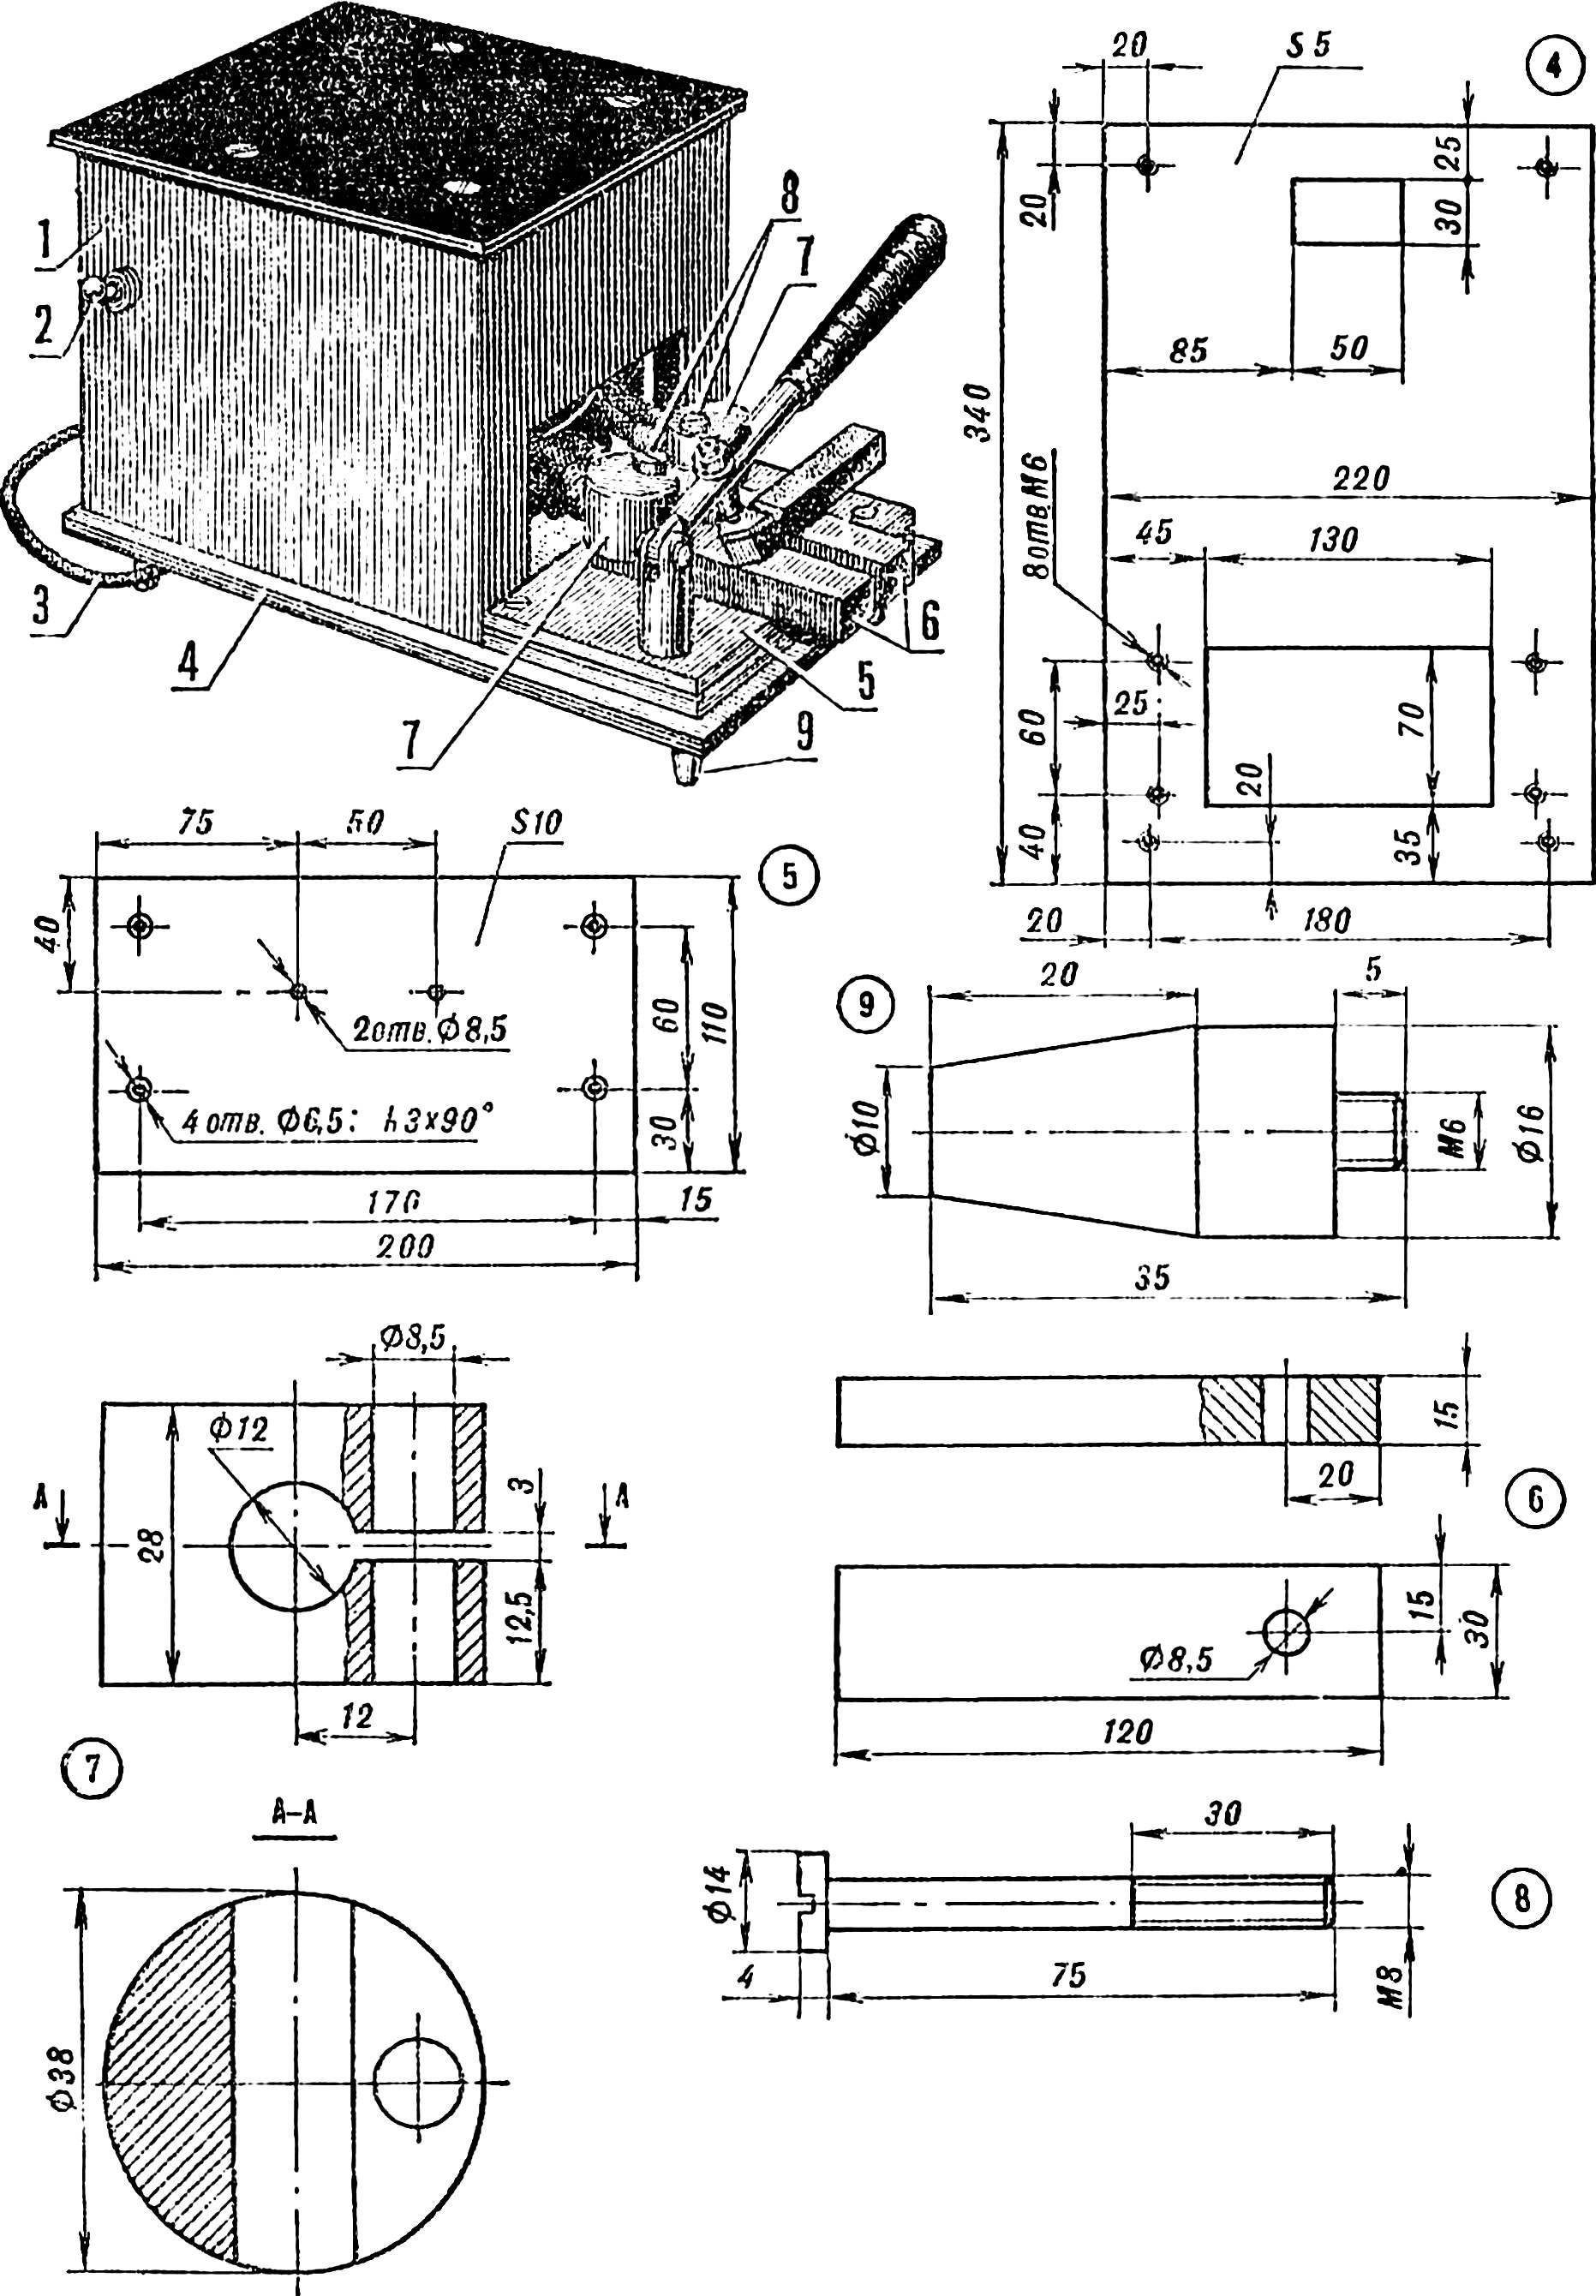 Fig. 1. Machine terminarea.